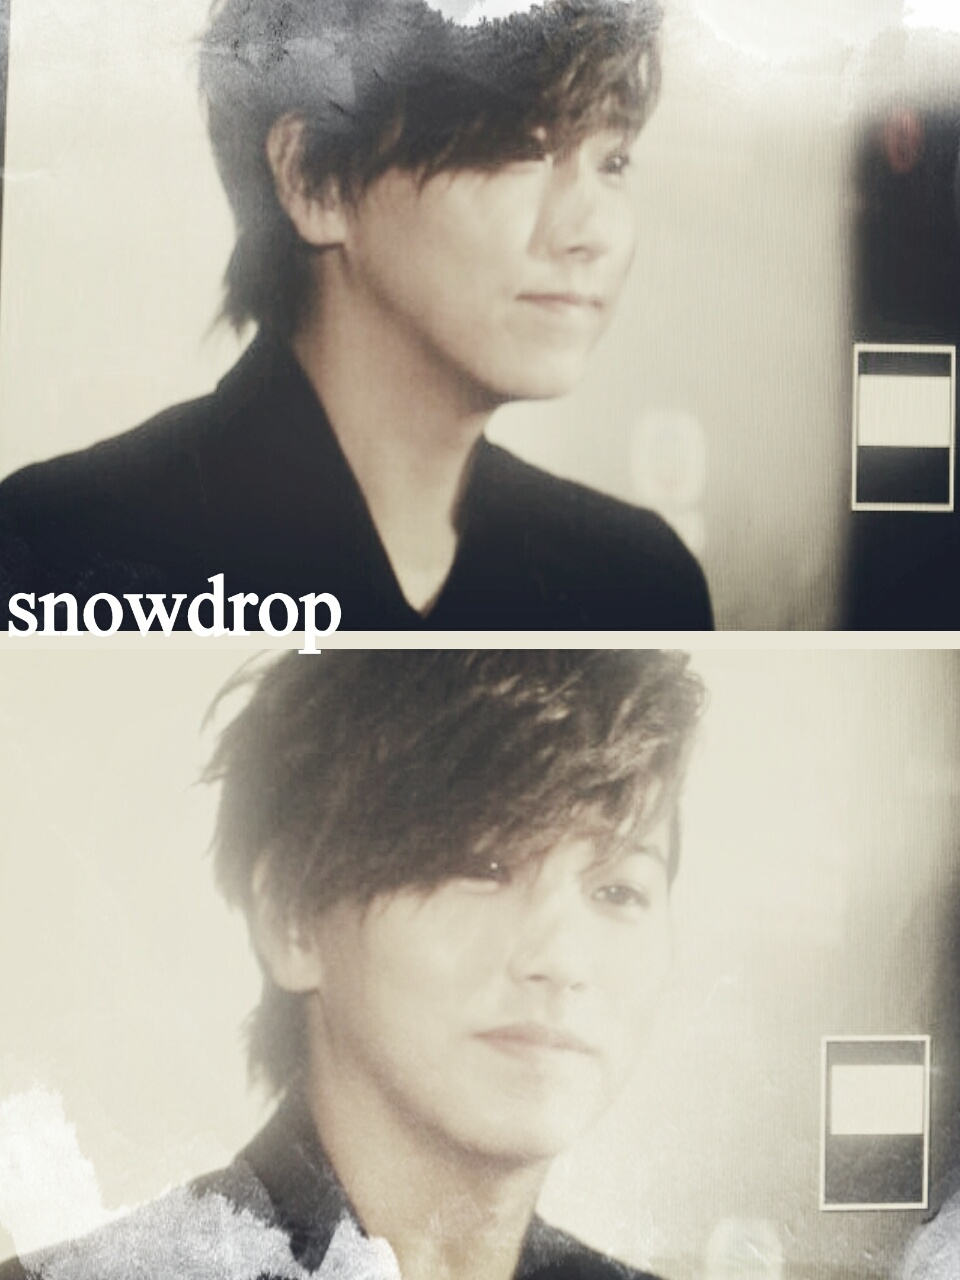 snowdrop-003